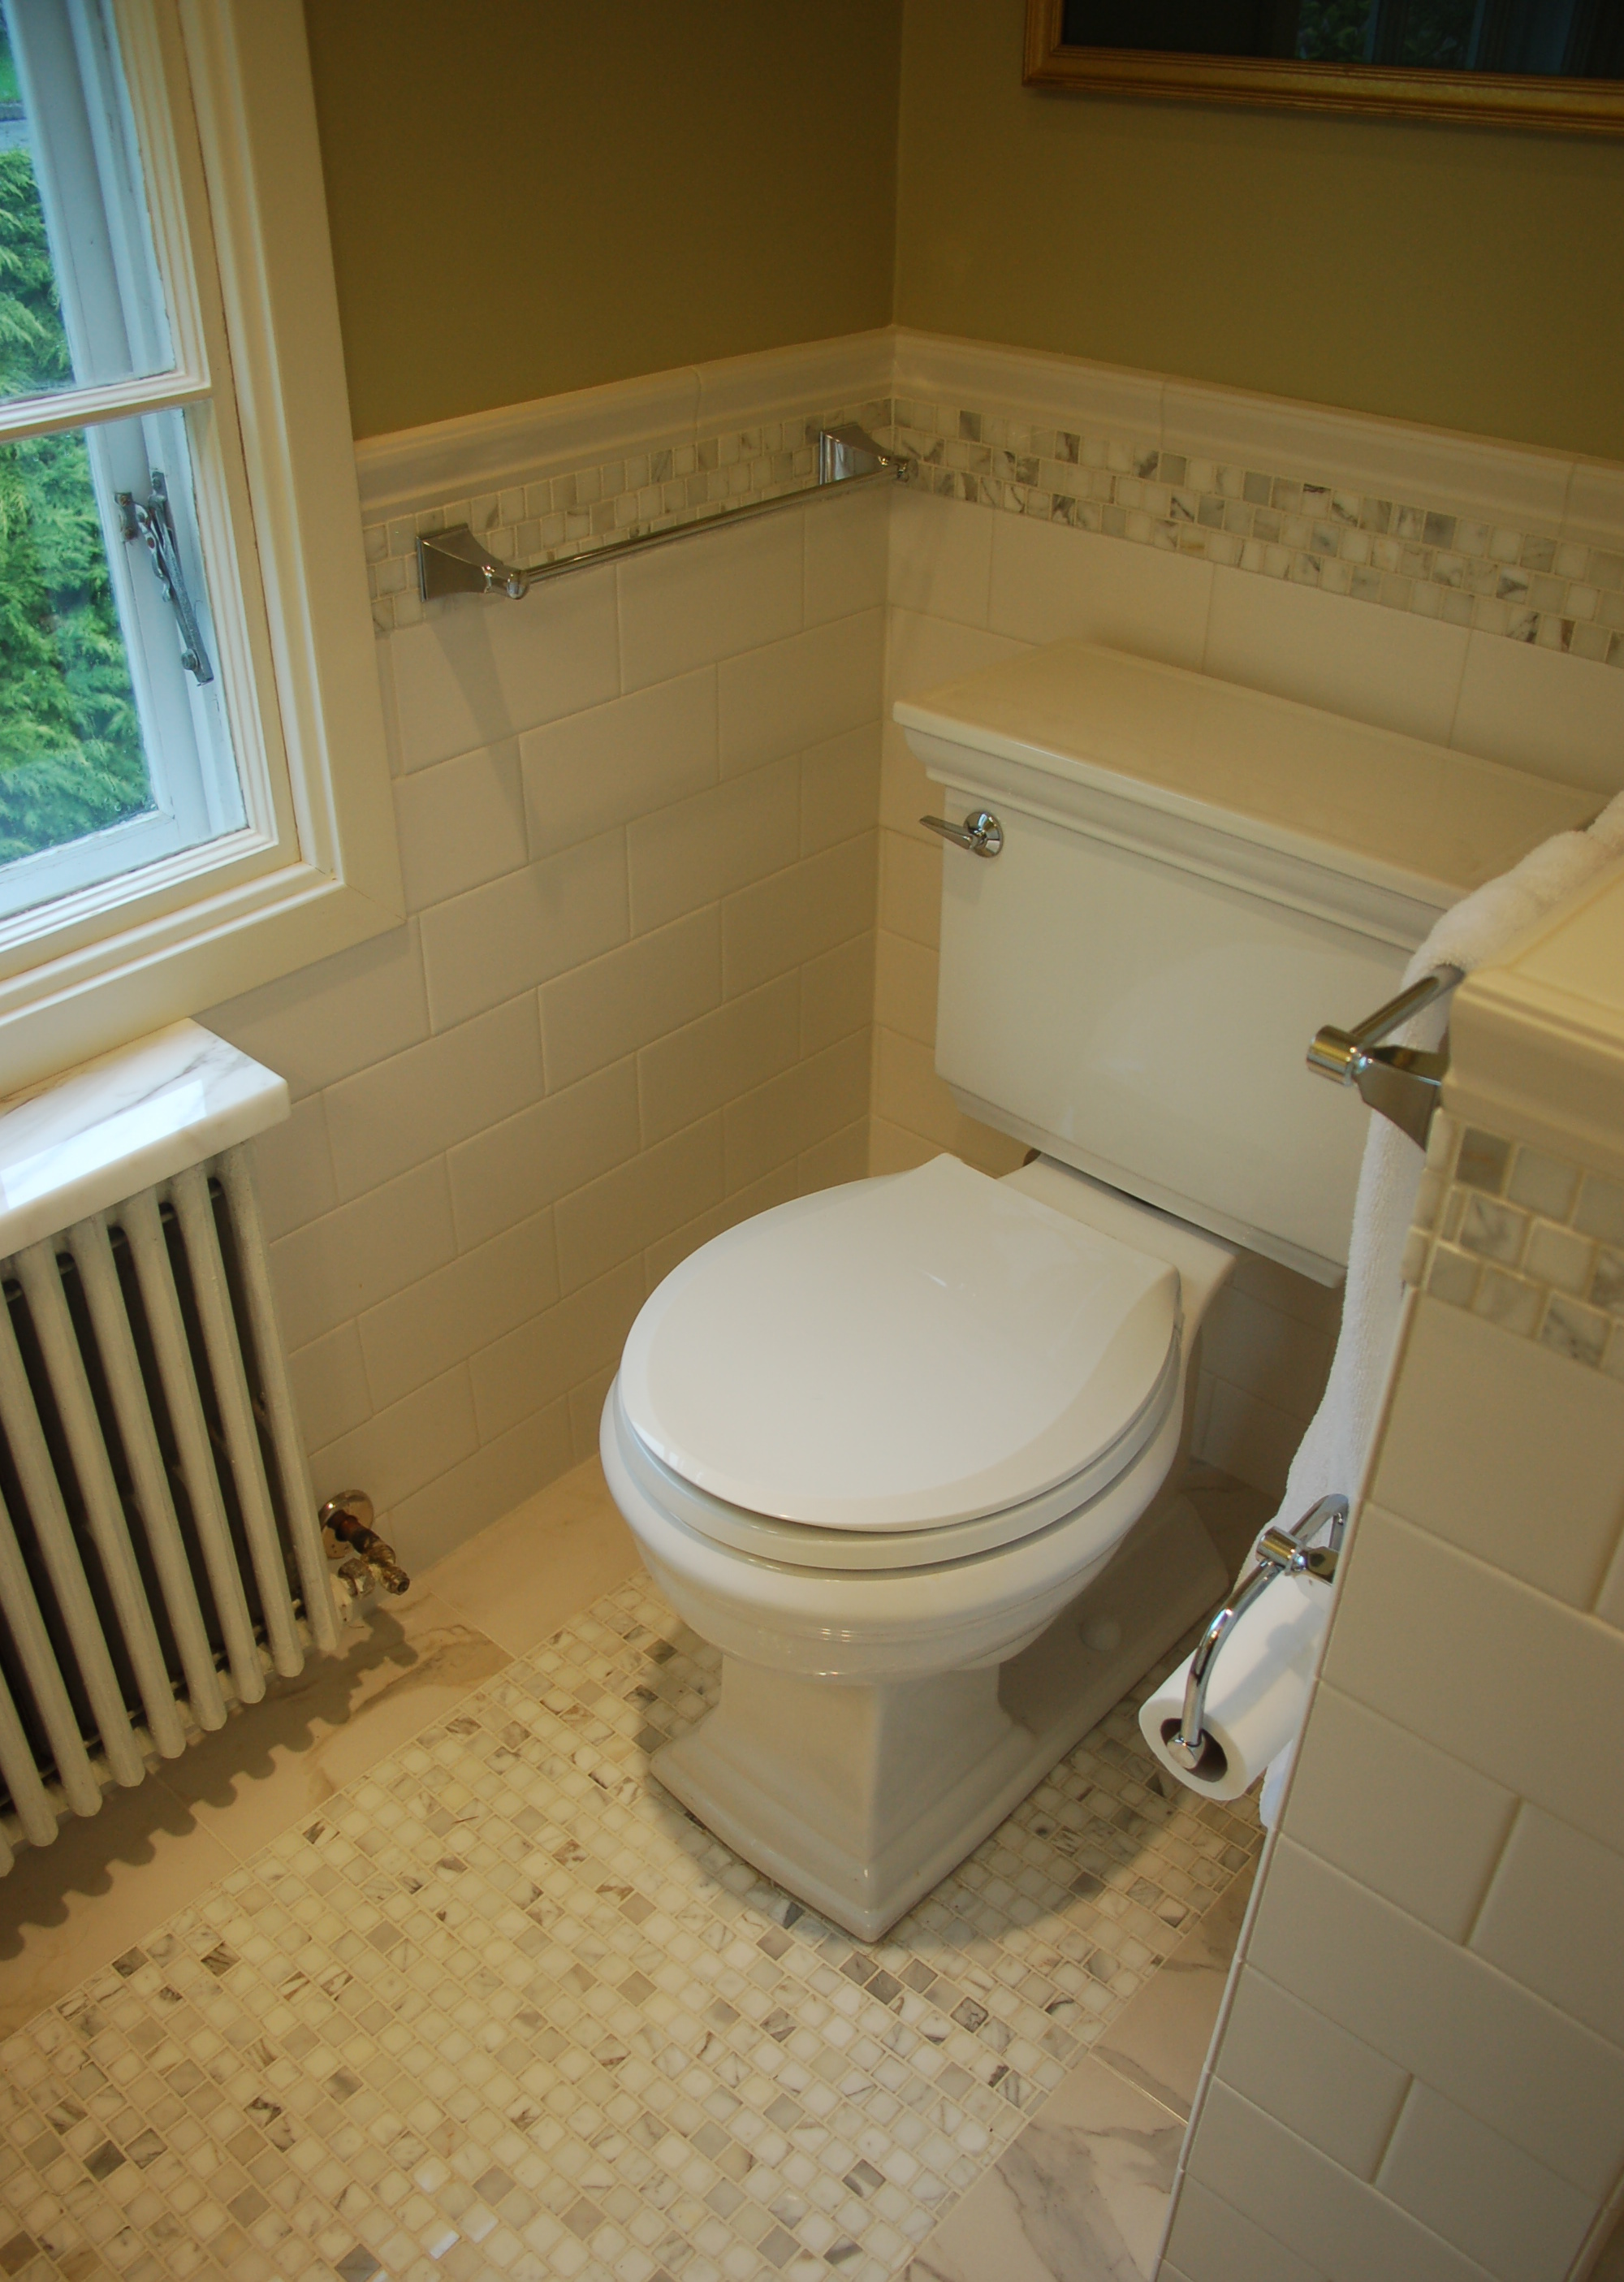 1930 39 s bathroom remodel favinger plumbing bellingham for Bathroom remodel plumbing